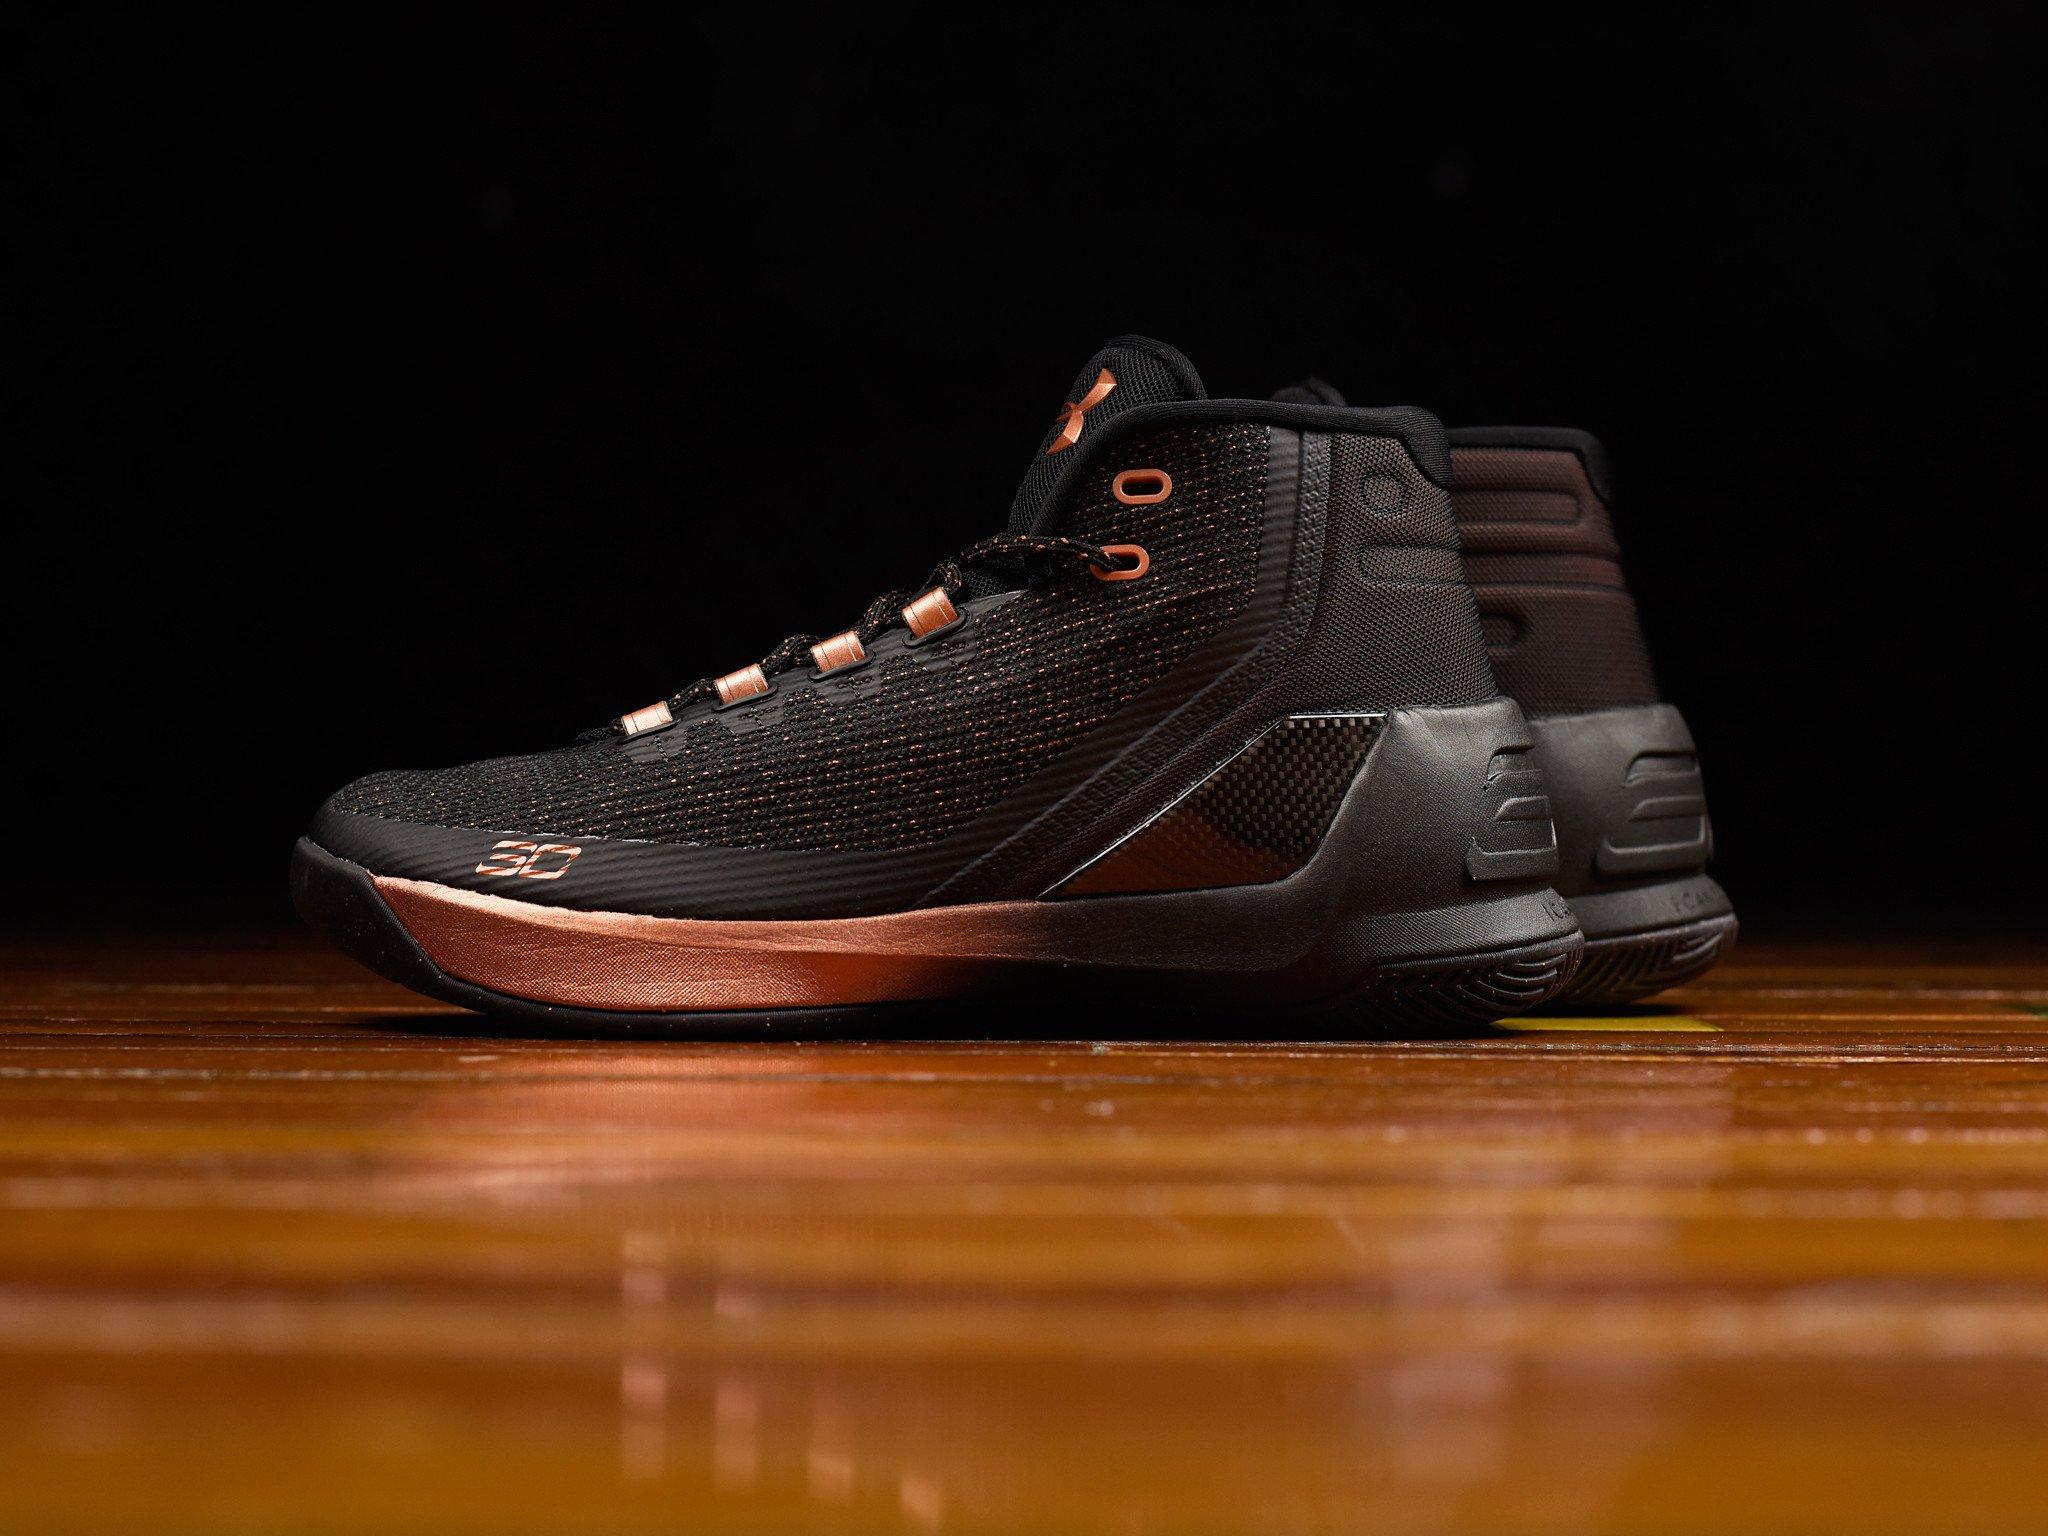 Orange Under Armour Basketball Shoes